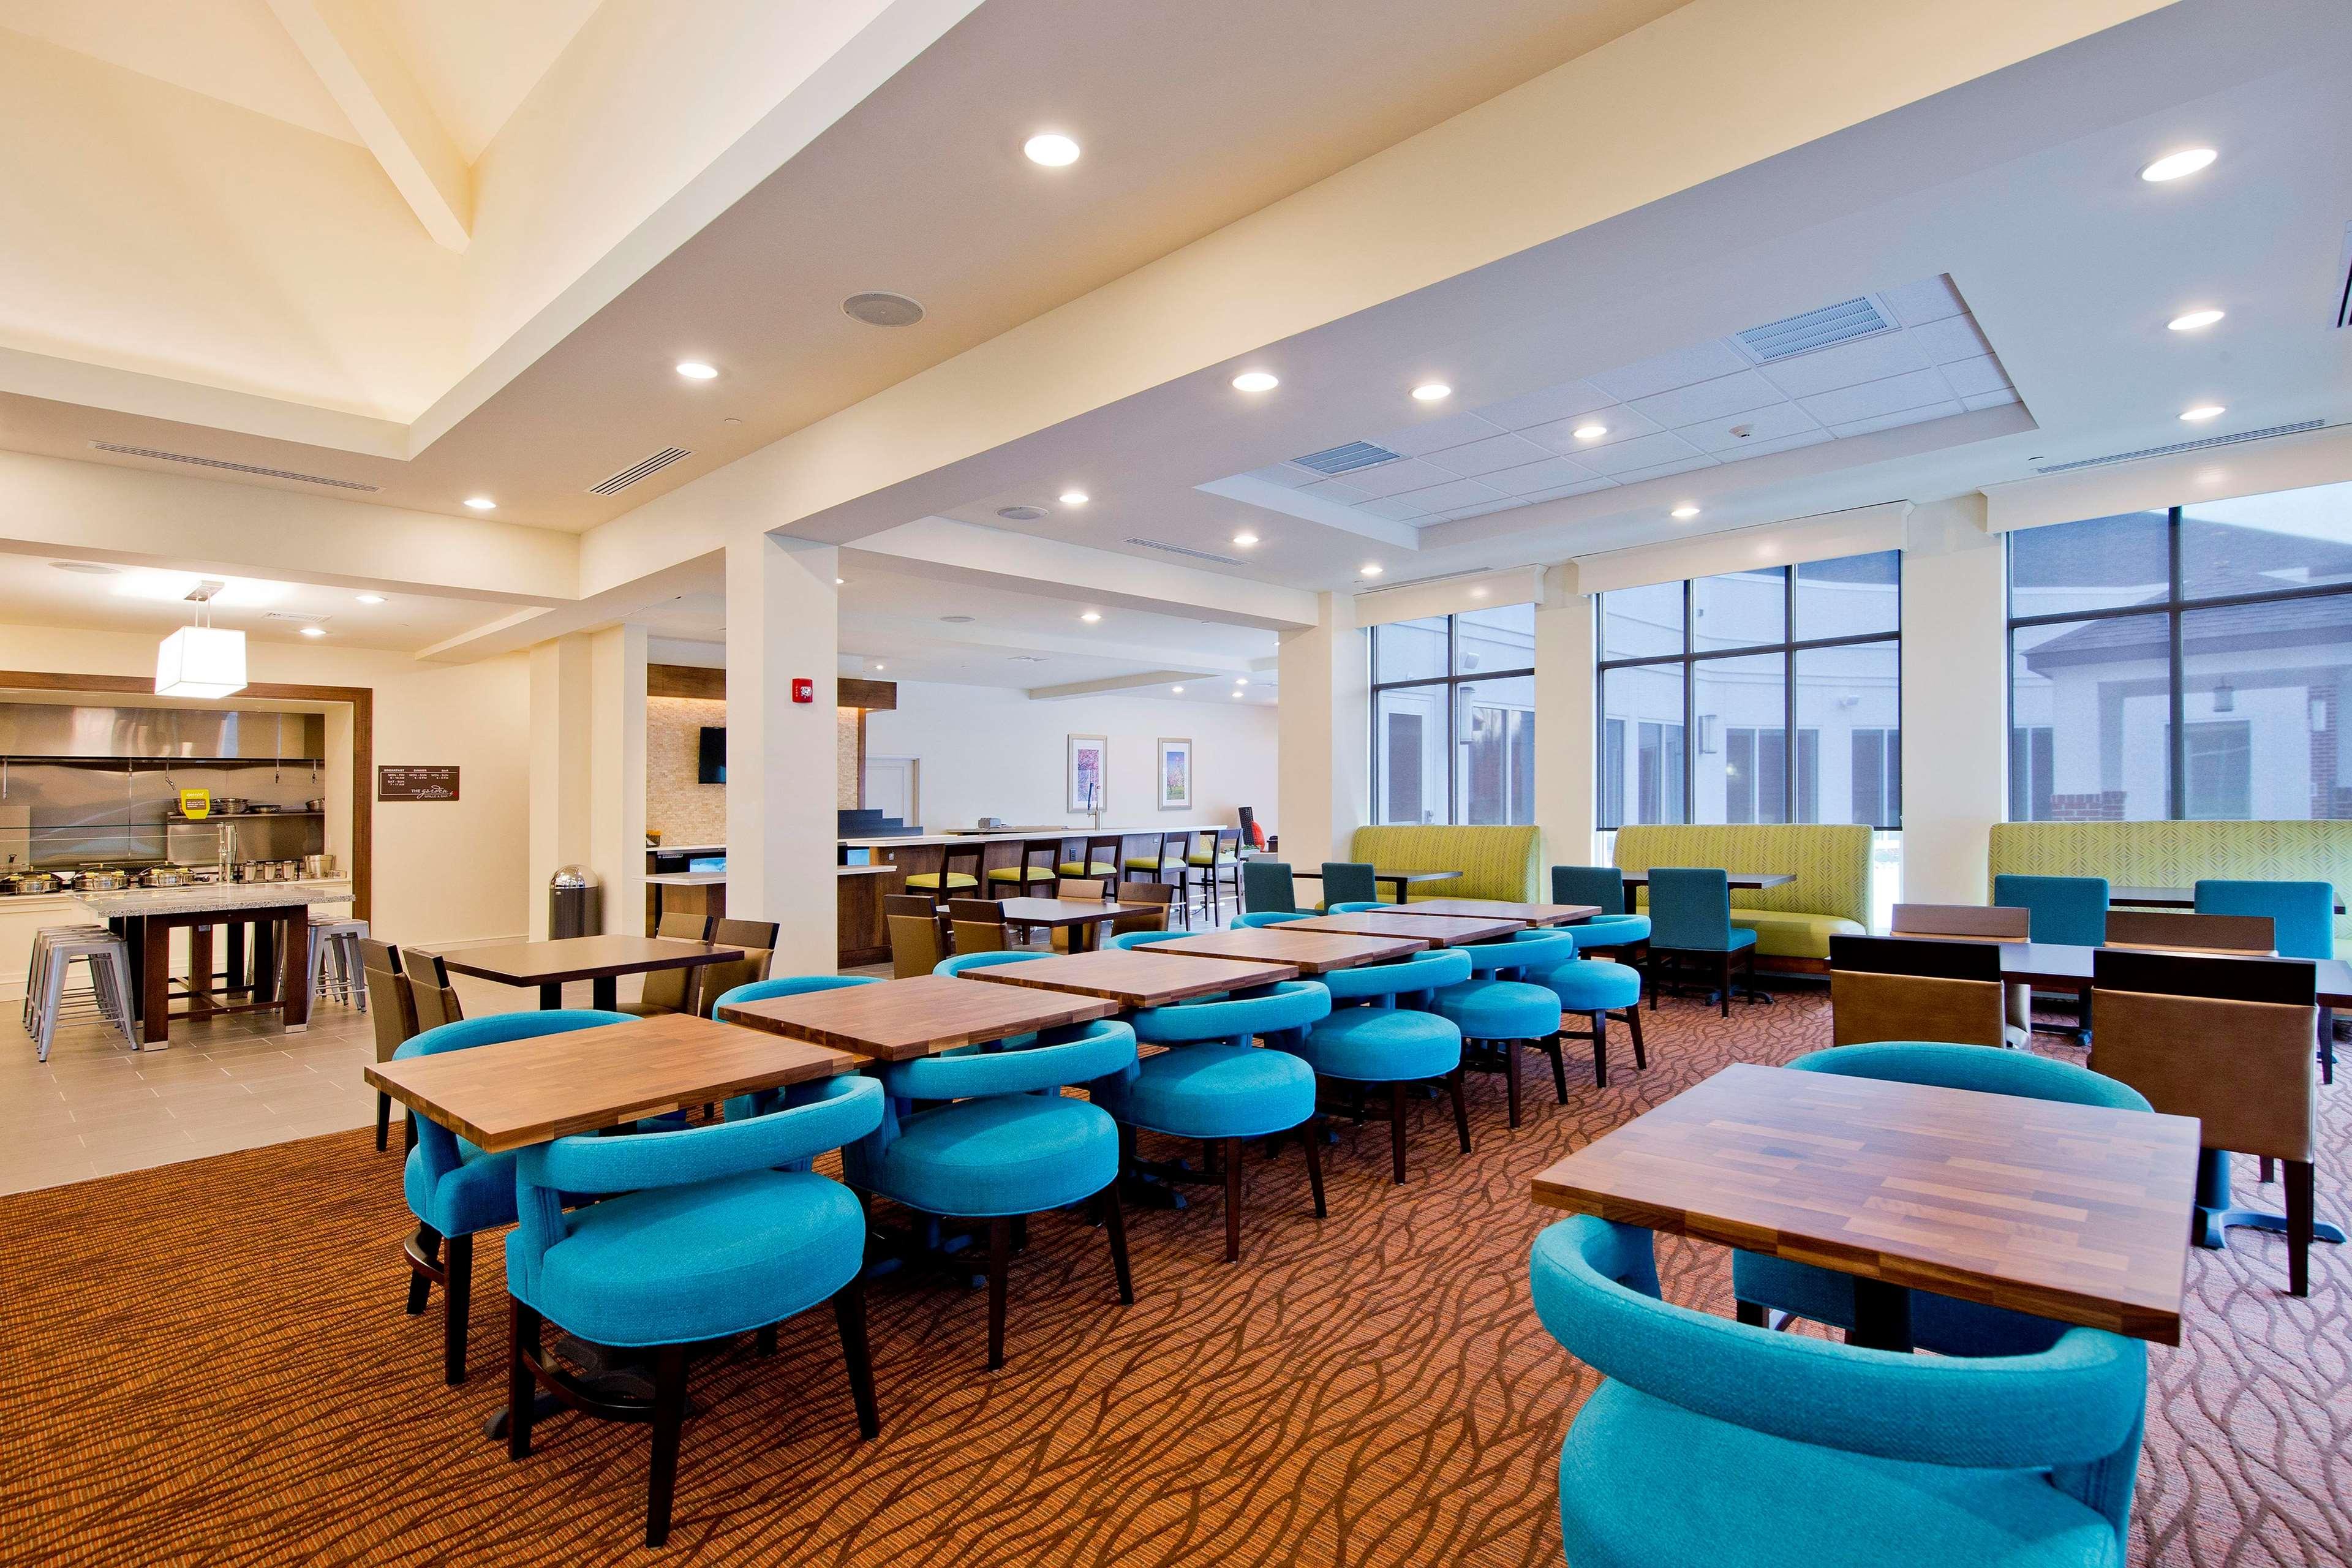 Hilton Hotels In Martinsburg Wv